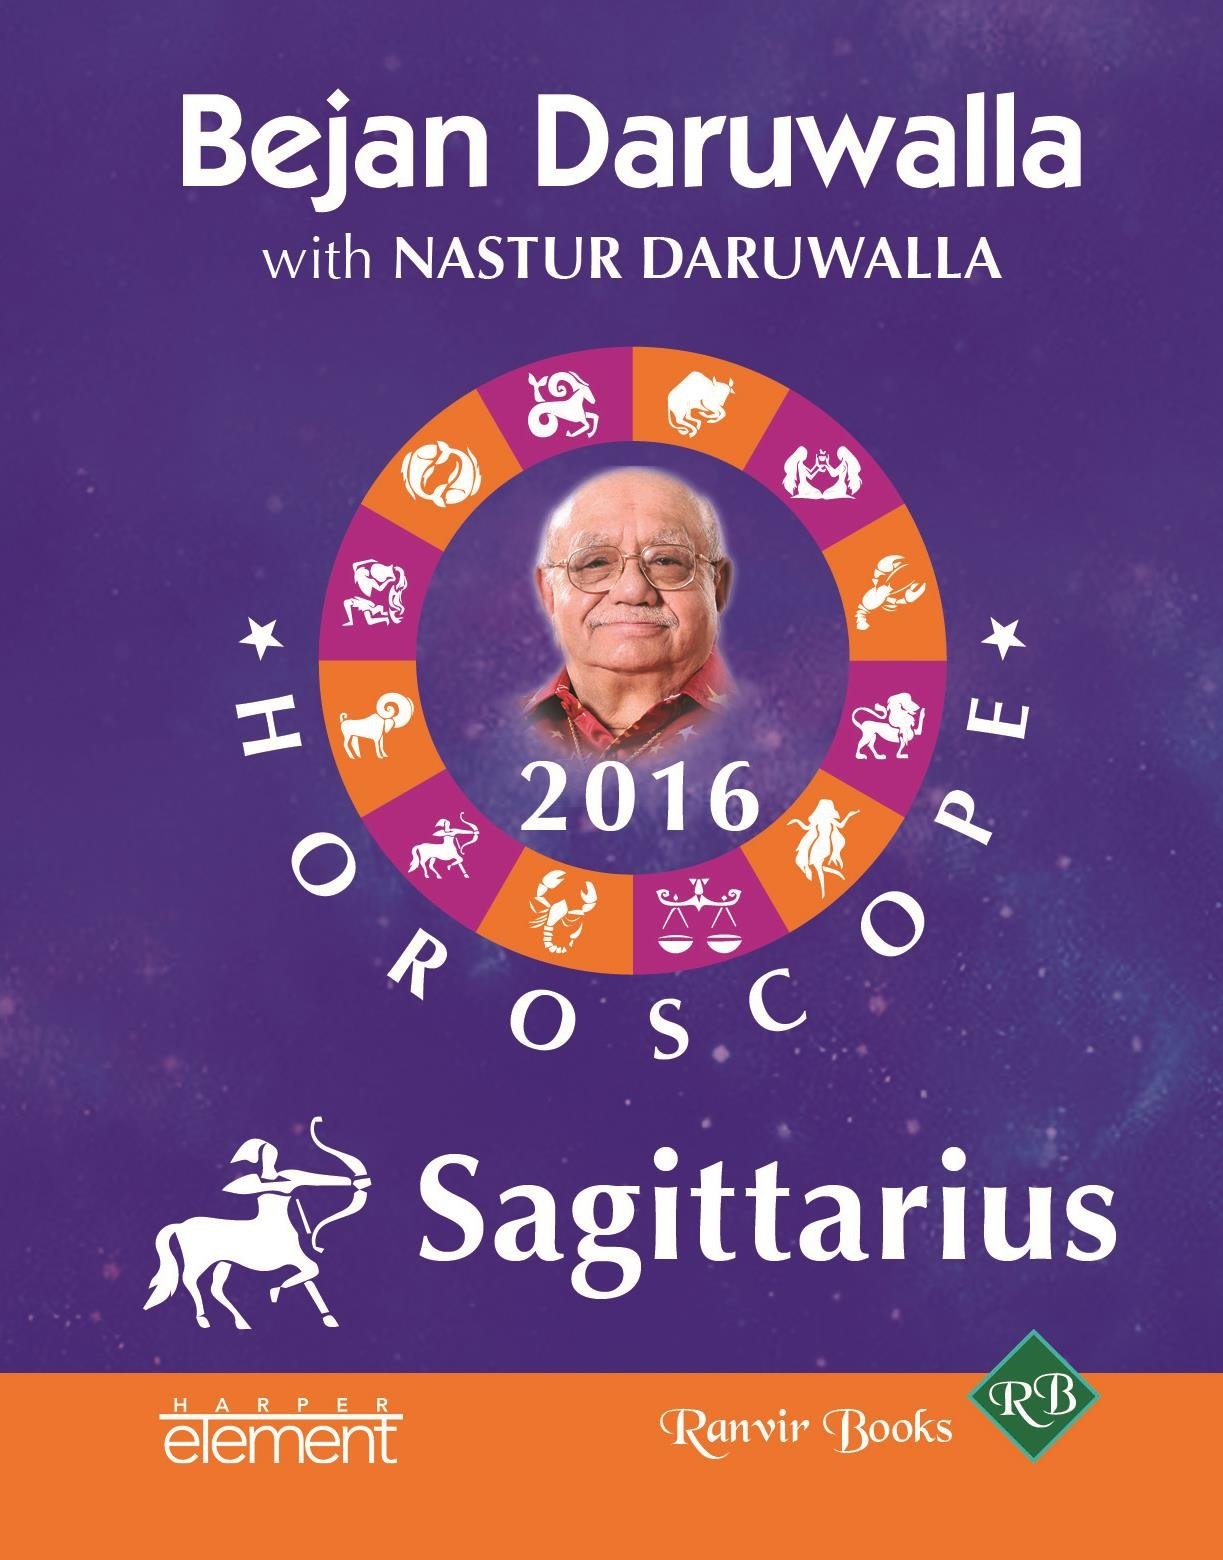 sagittarius horoscope today bejan daruwalla